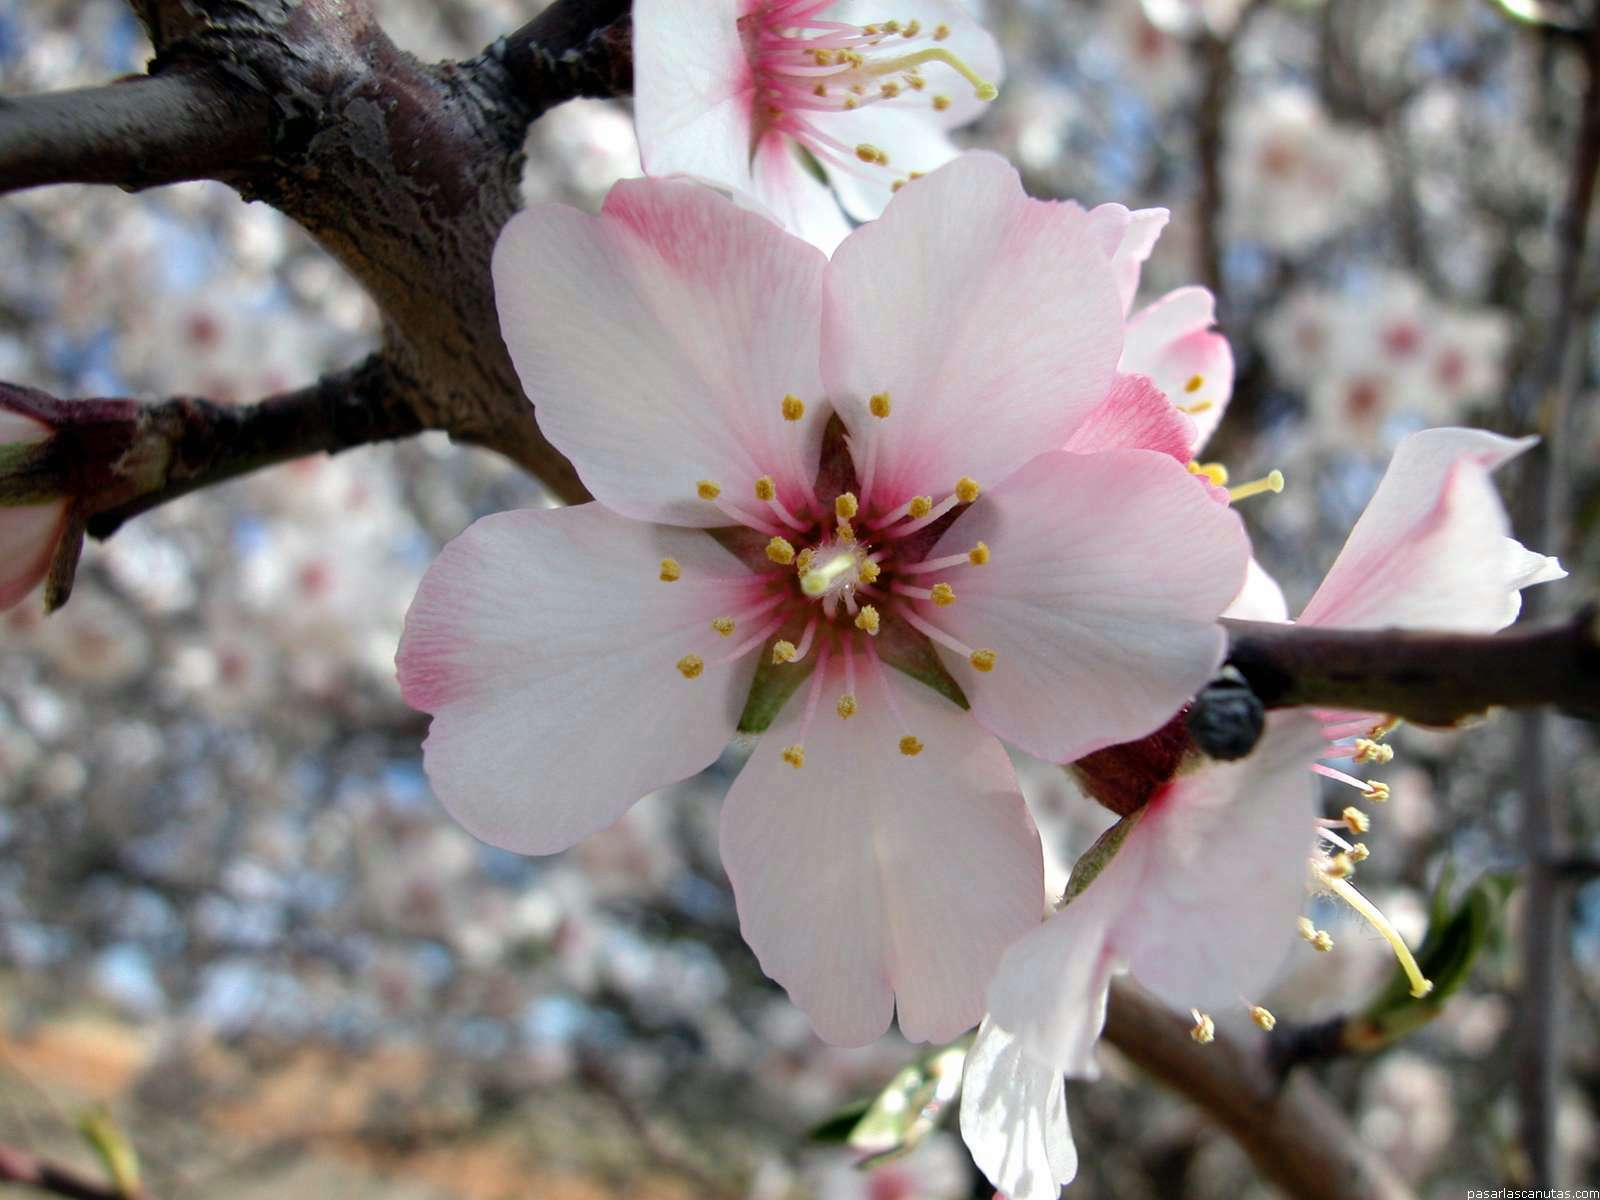 Flores Blancas Png 800 600: Fondos De Pantalla De Alta Calidad De Flores 1